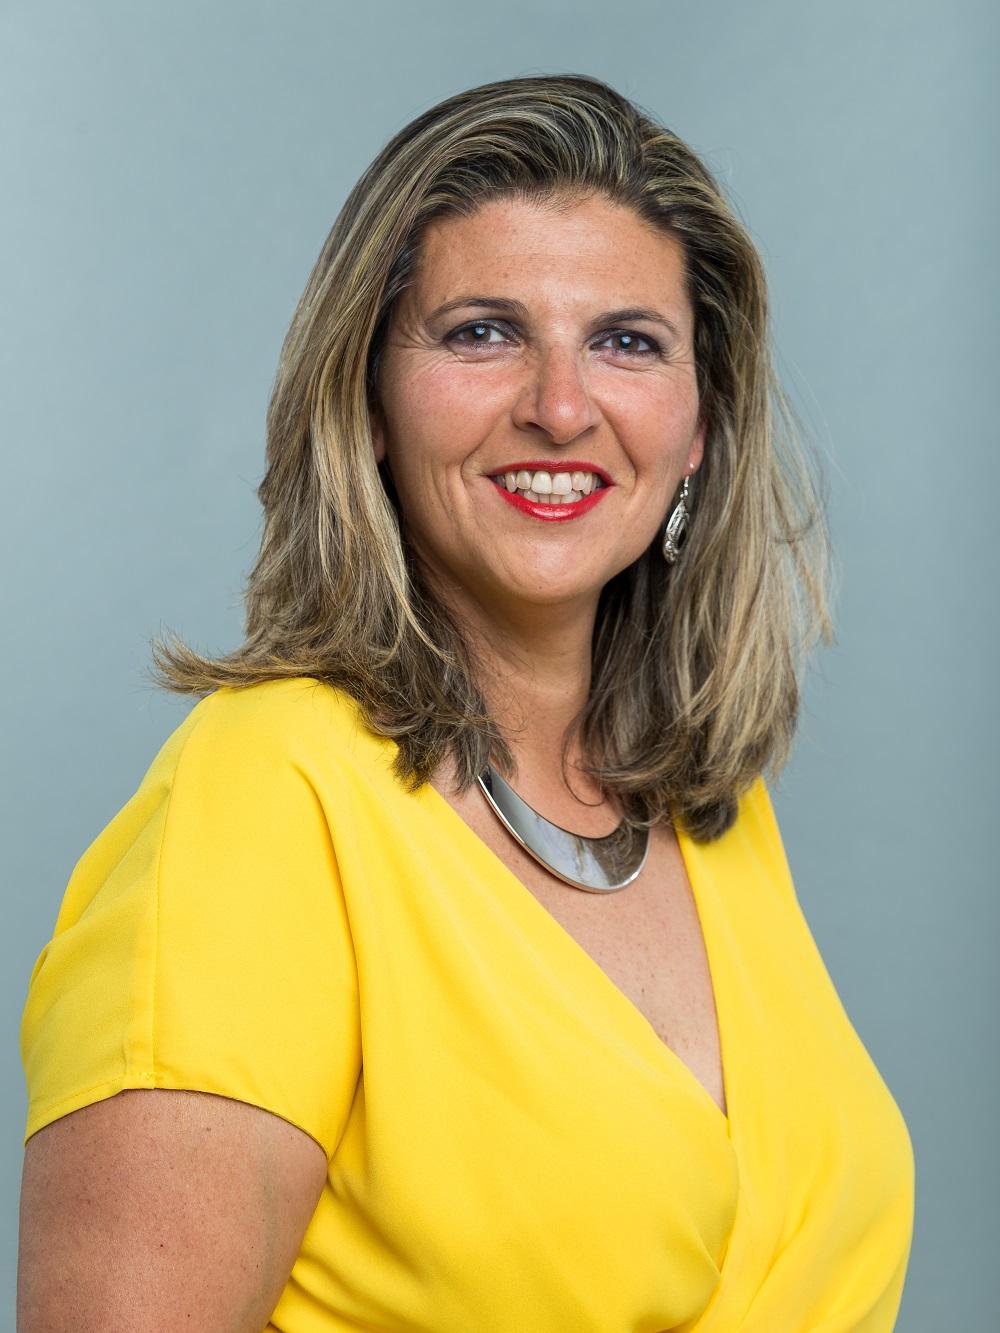 Natalia Ramírez Peñate